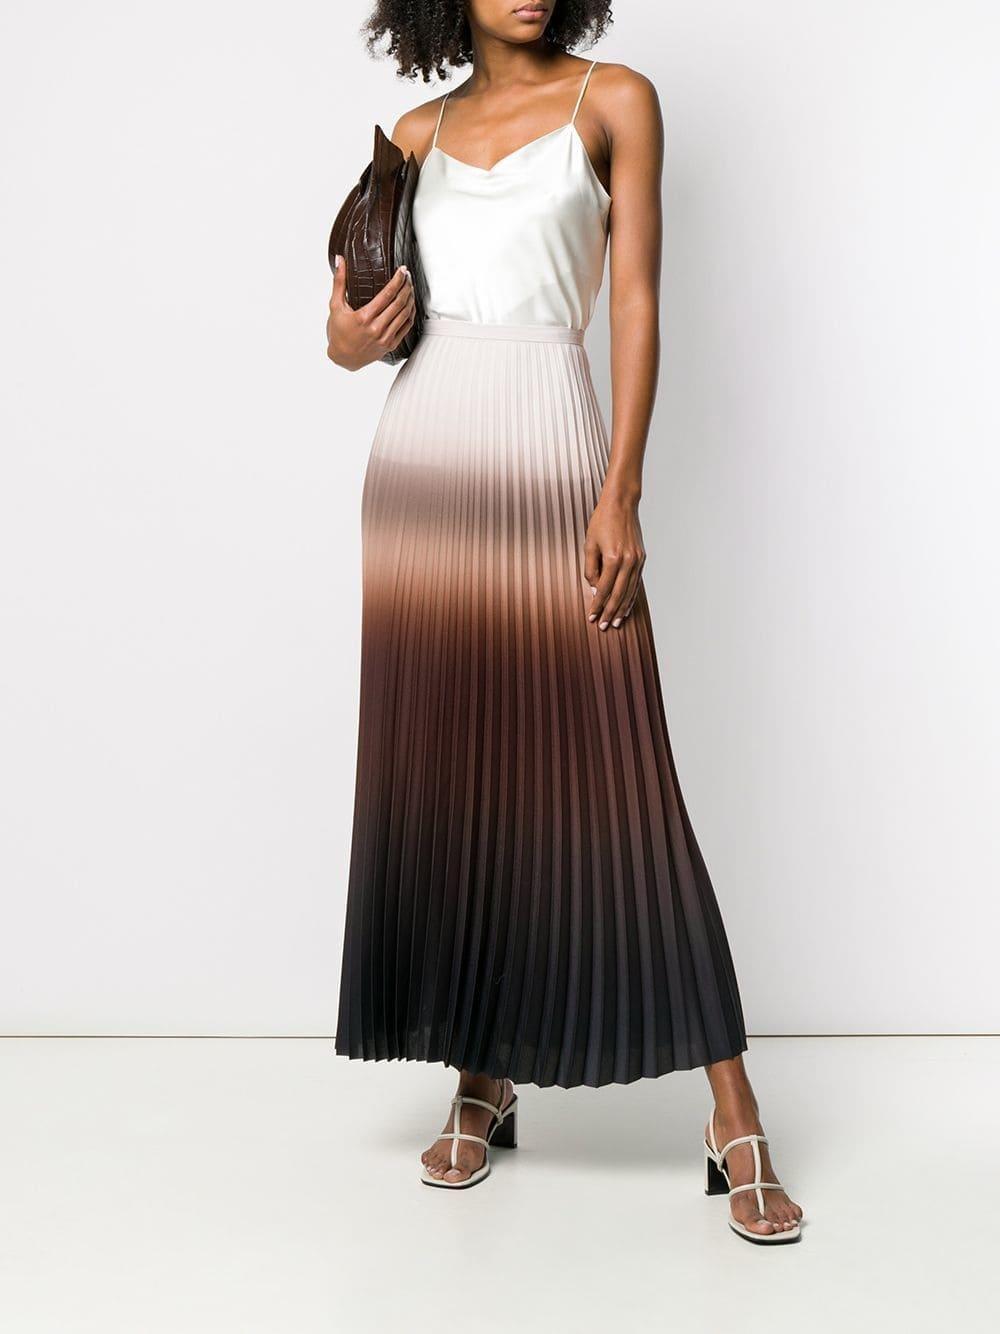 9091108c8fc1 Lyst - Max Mara Skirt Women in Brown - Save 58%